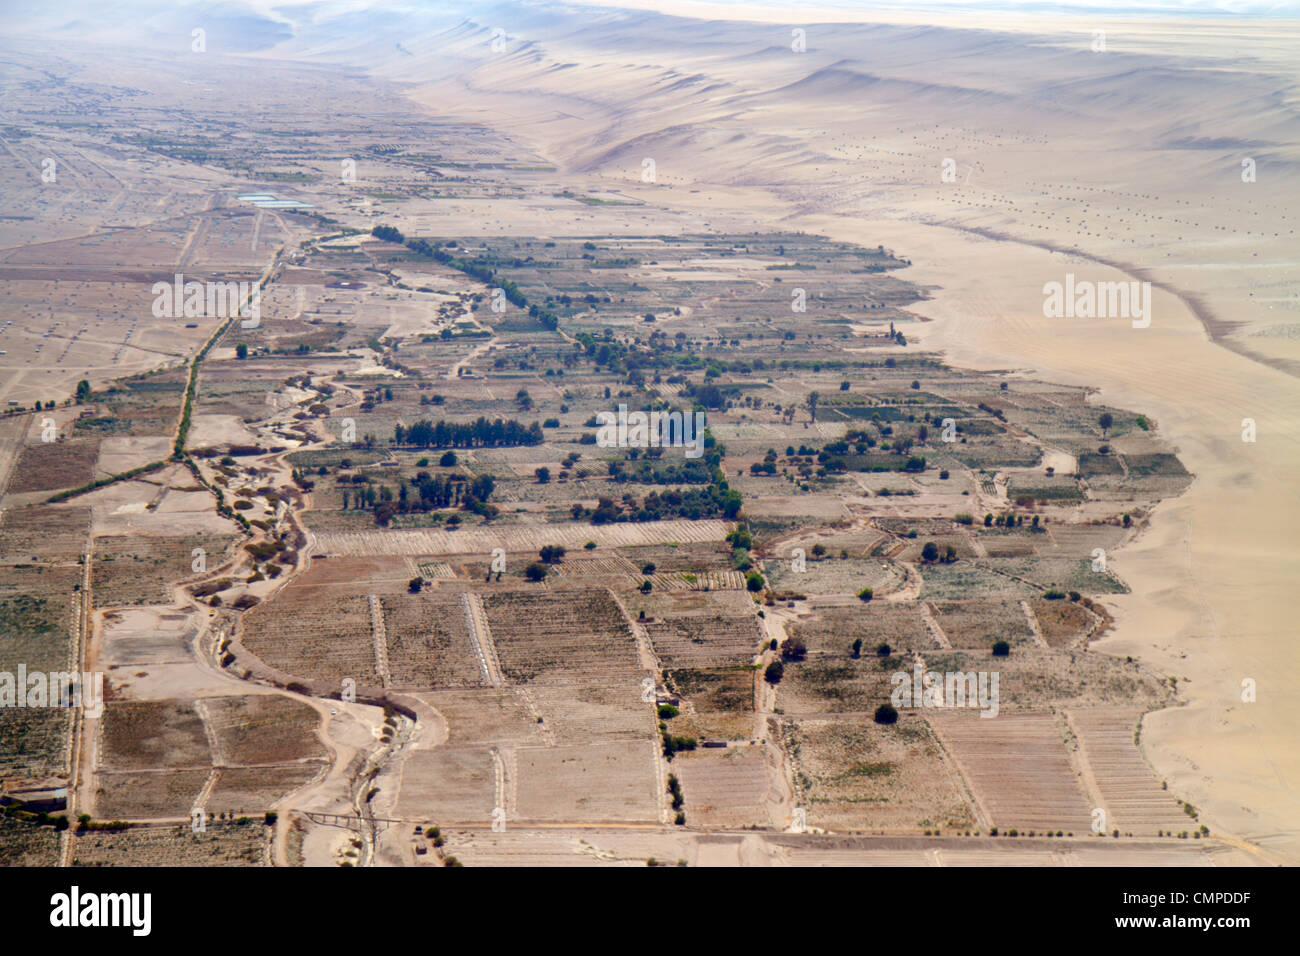 mild desert climate stock photos mild desert climate stock images